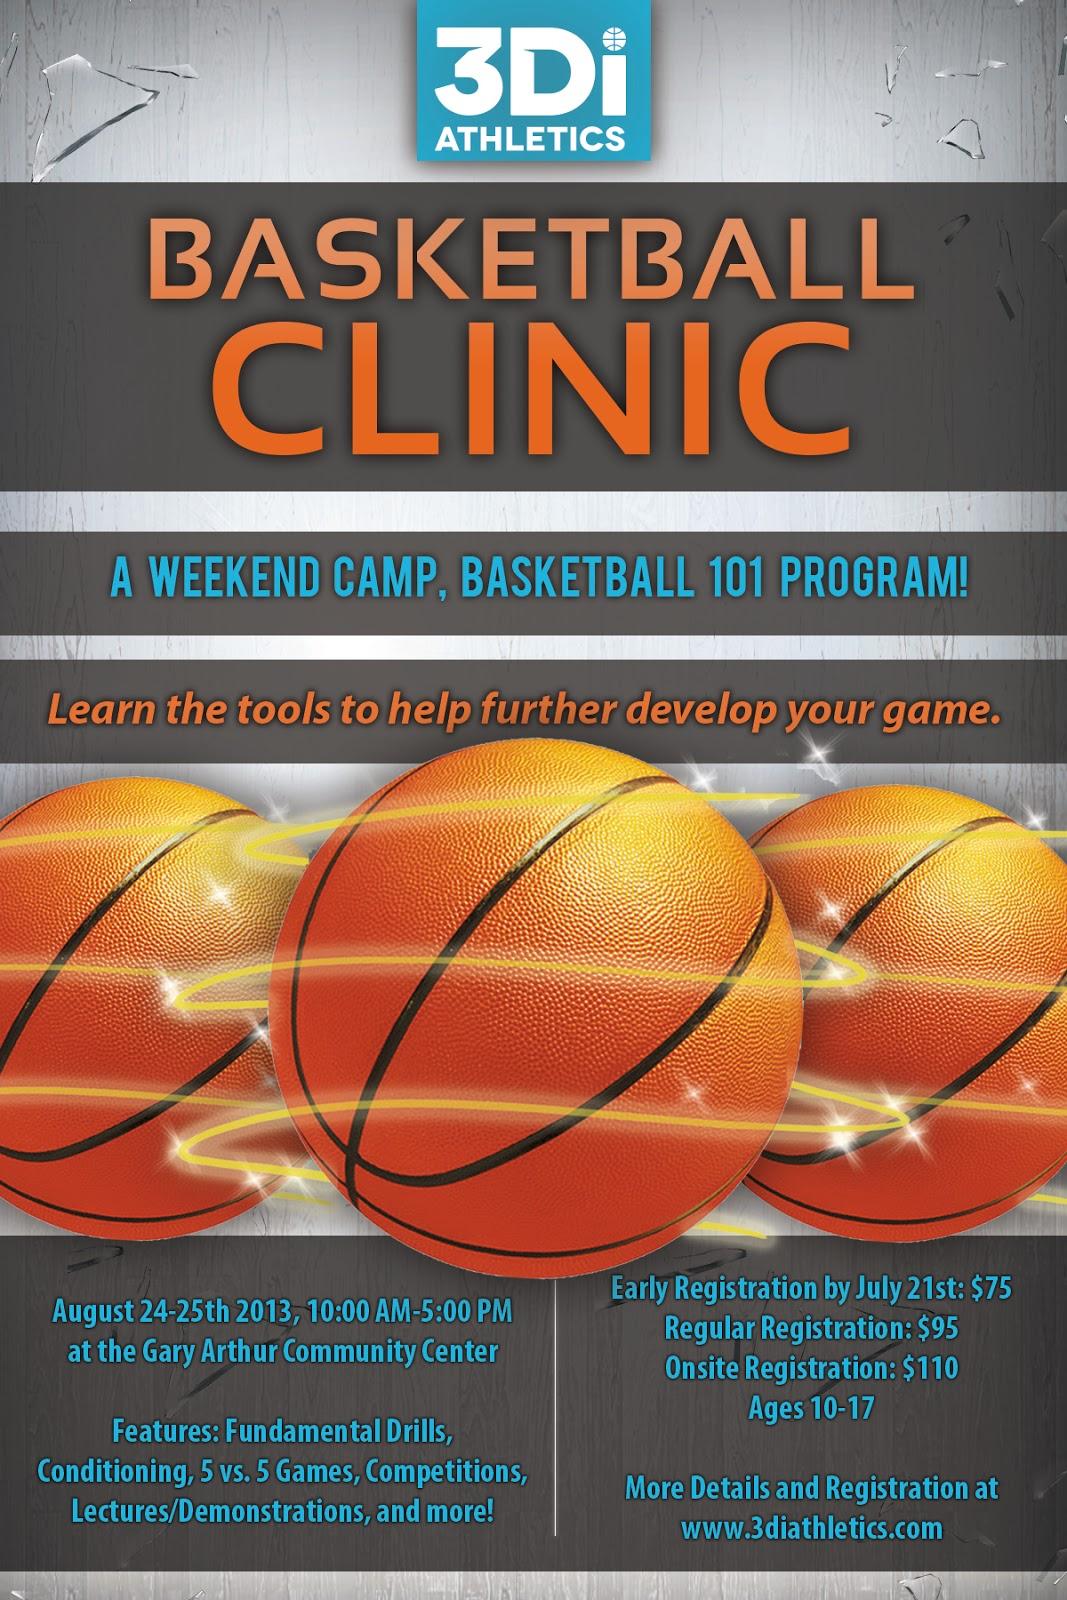 Basketball Camp Flyers Templates Weekend basketball camp